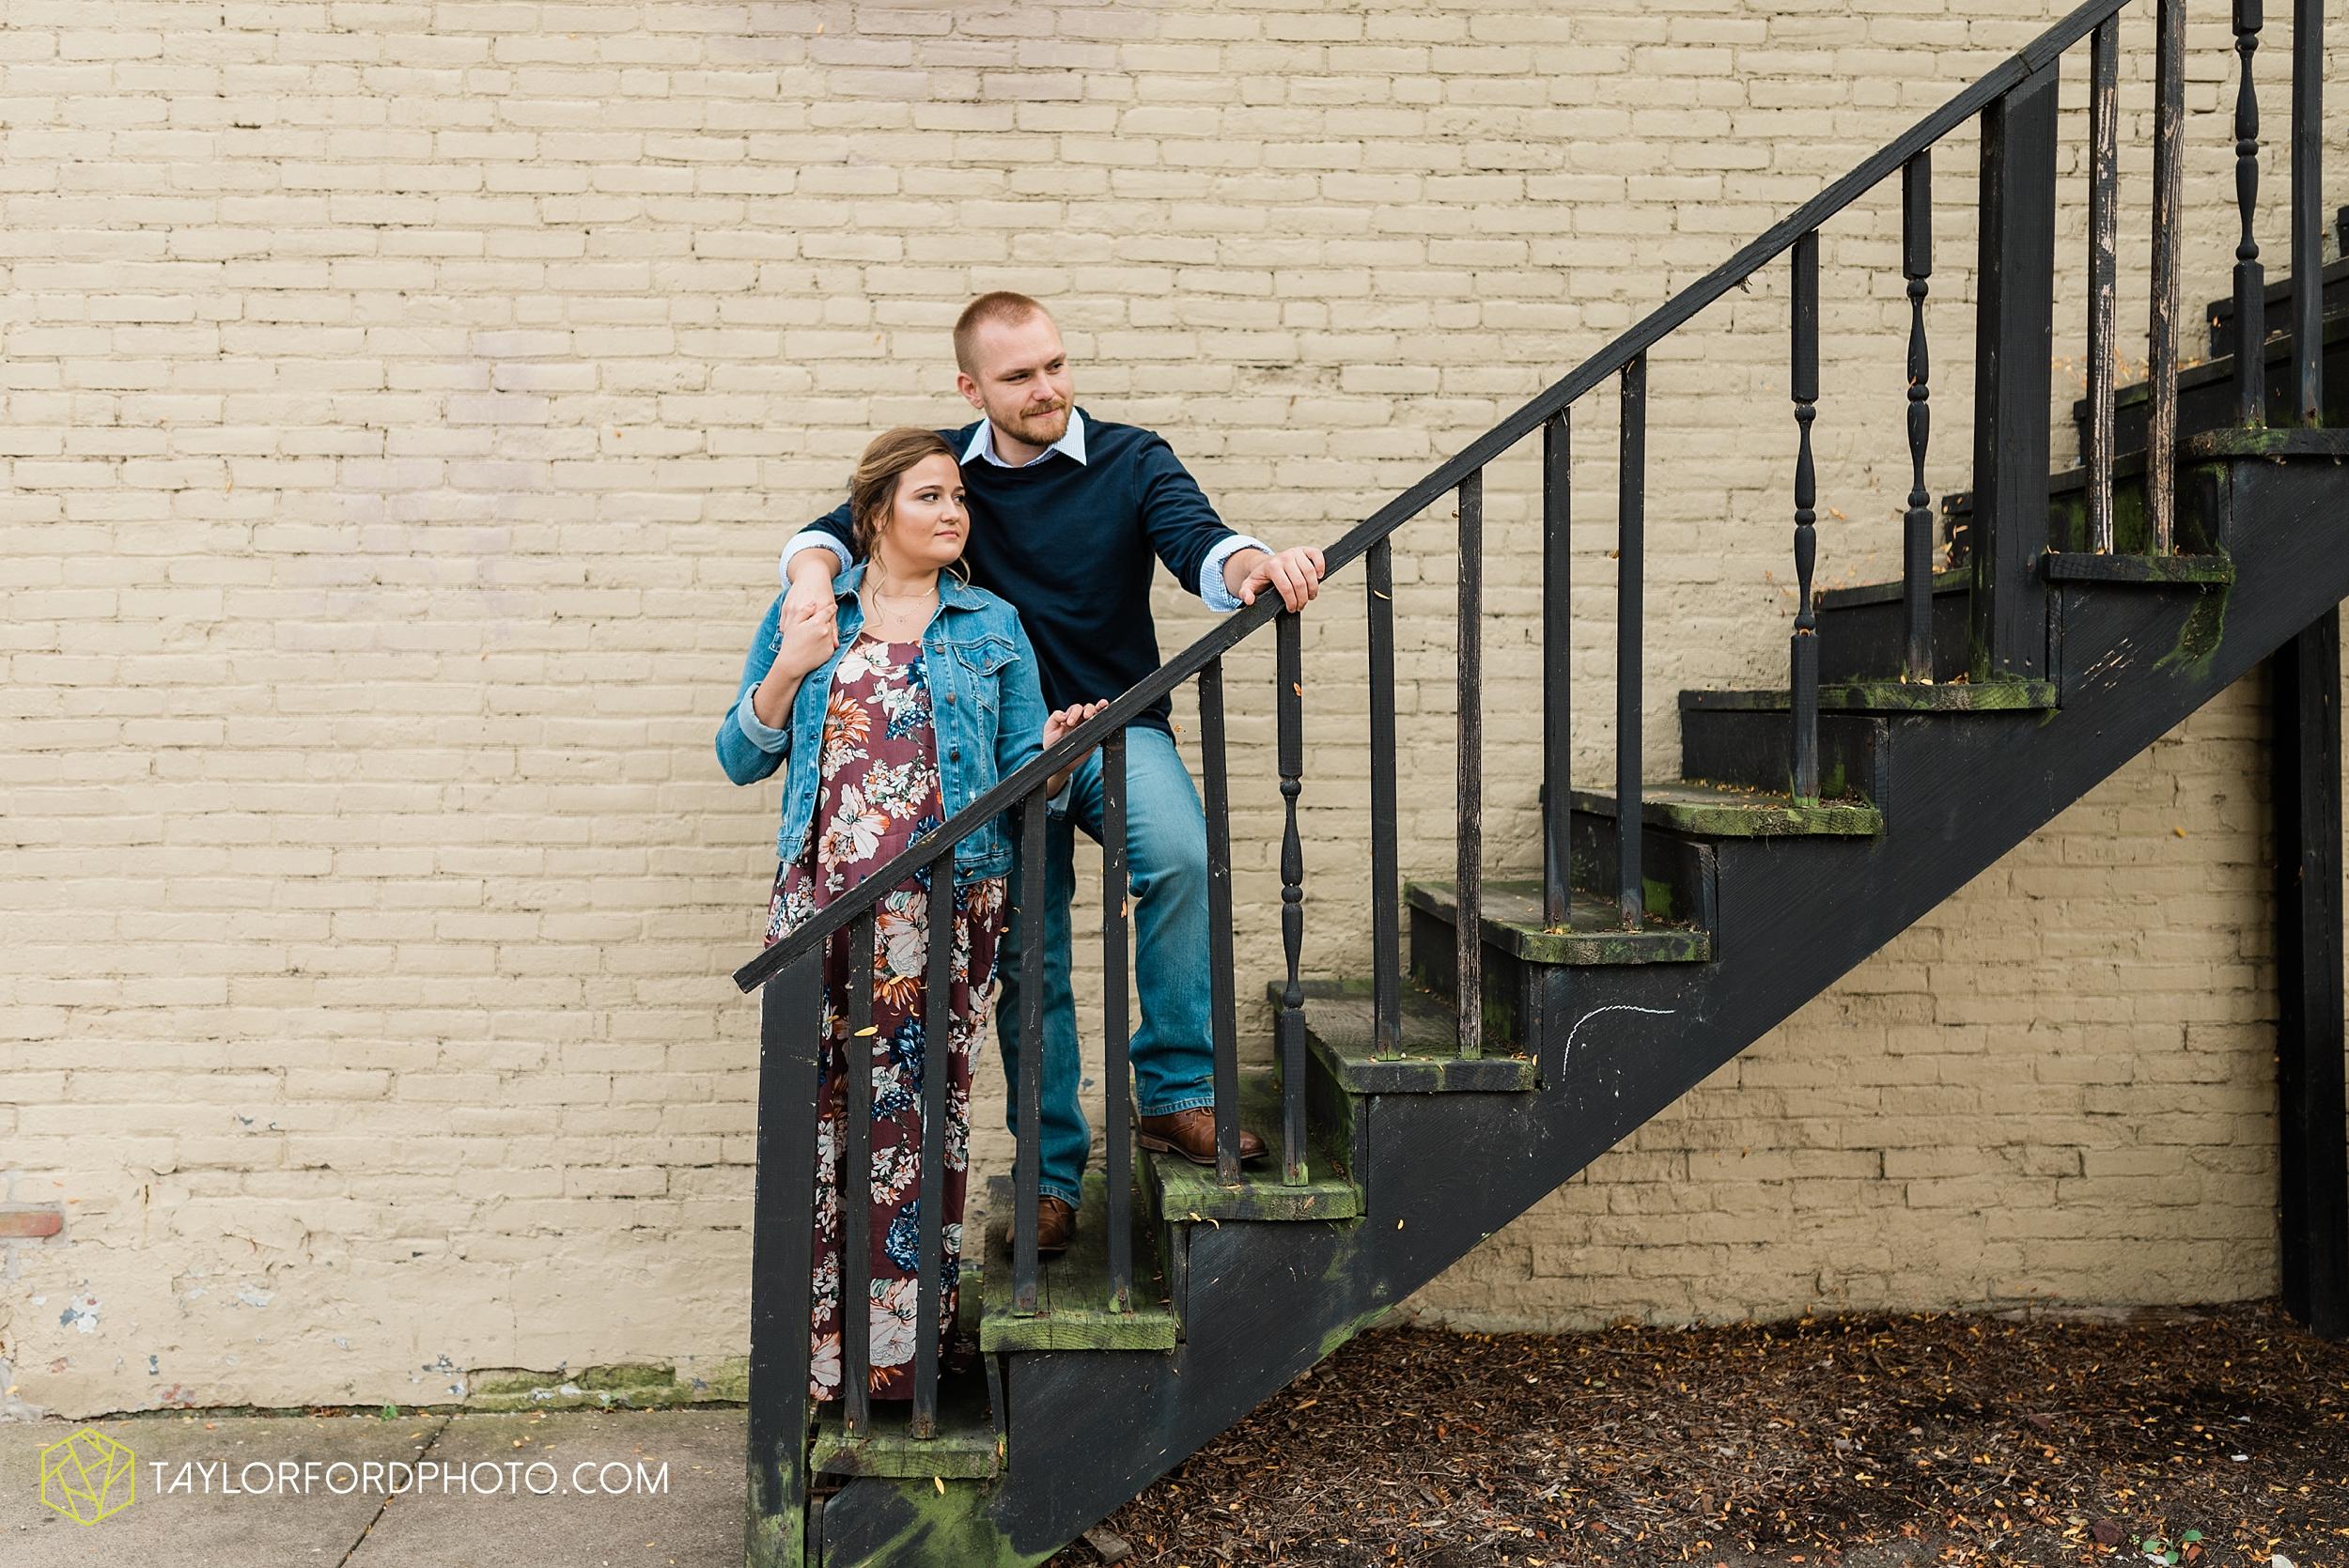 sidecut-metro-park-downtown-toledo-maumee-perrysburg-ohio-engagement-photographer-taylor-ford-photography_9747.jpg